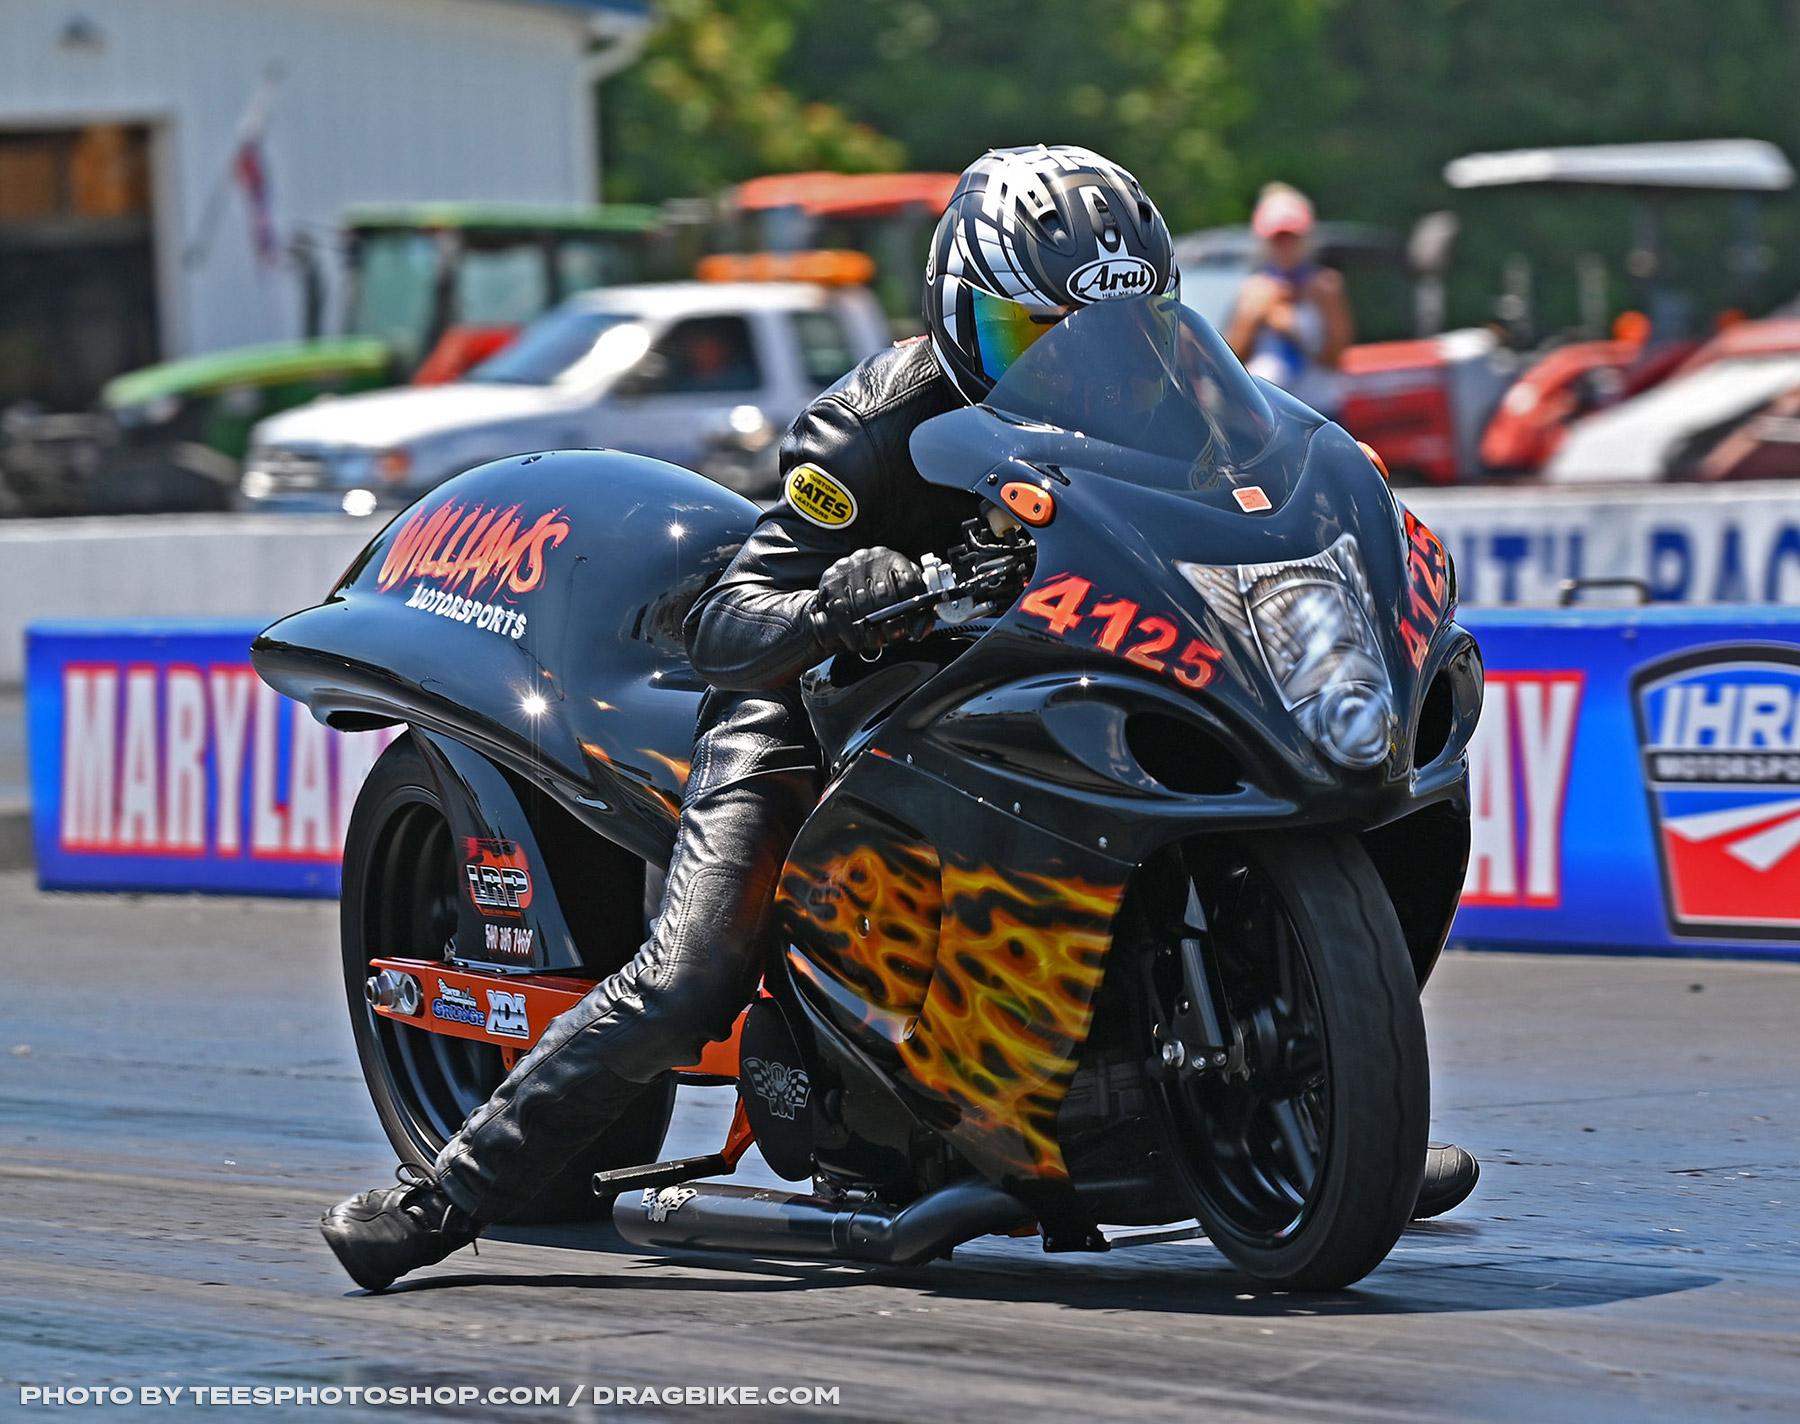 Calvin Williams Grudge racing - 2020 XDA Motorcycle Drag Racing